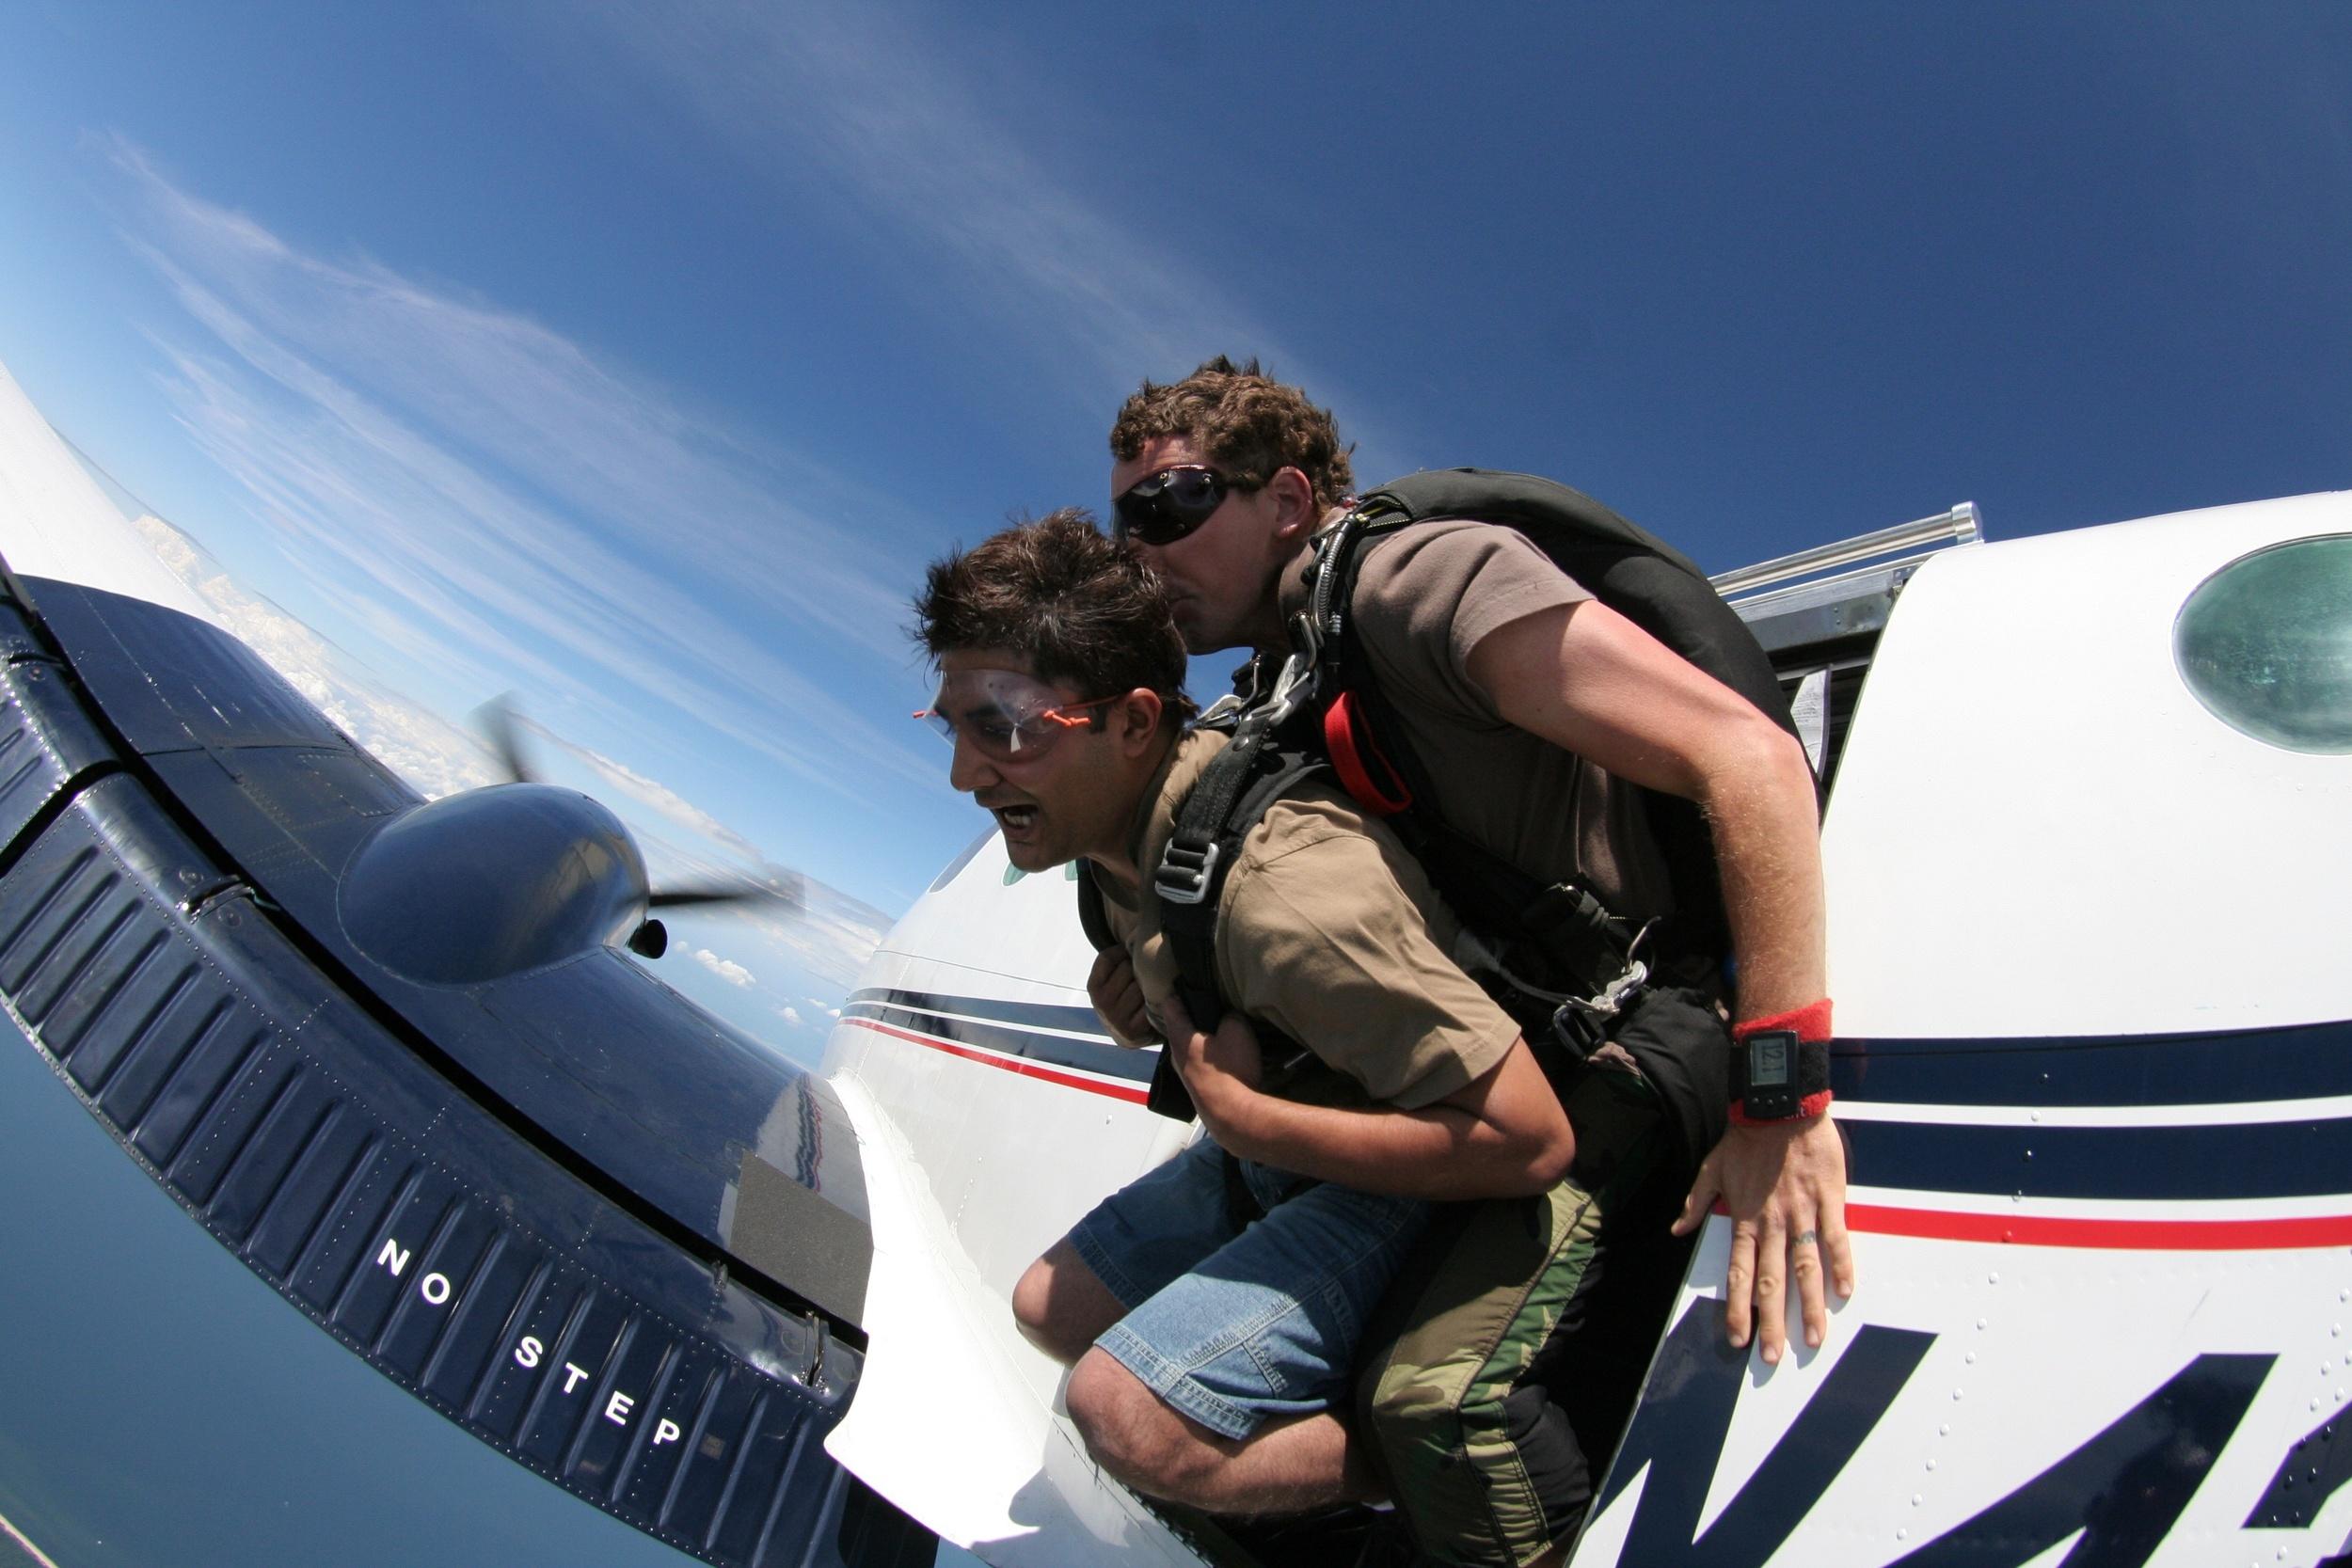 Subject Skydiving.jpg